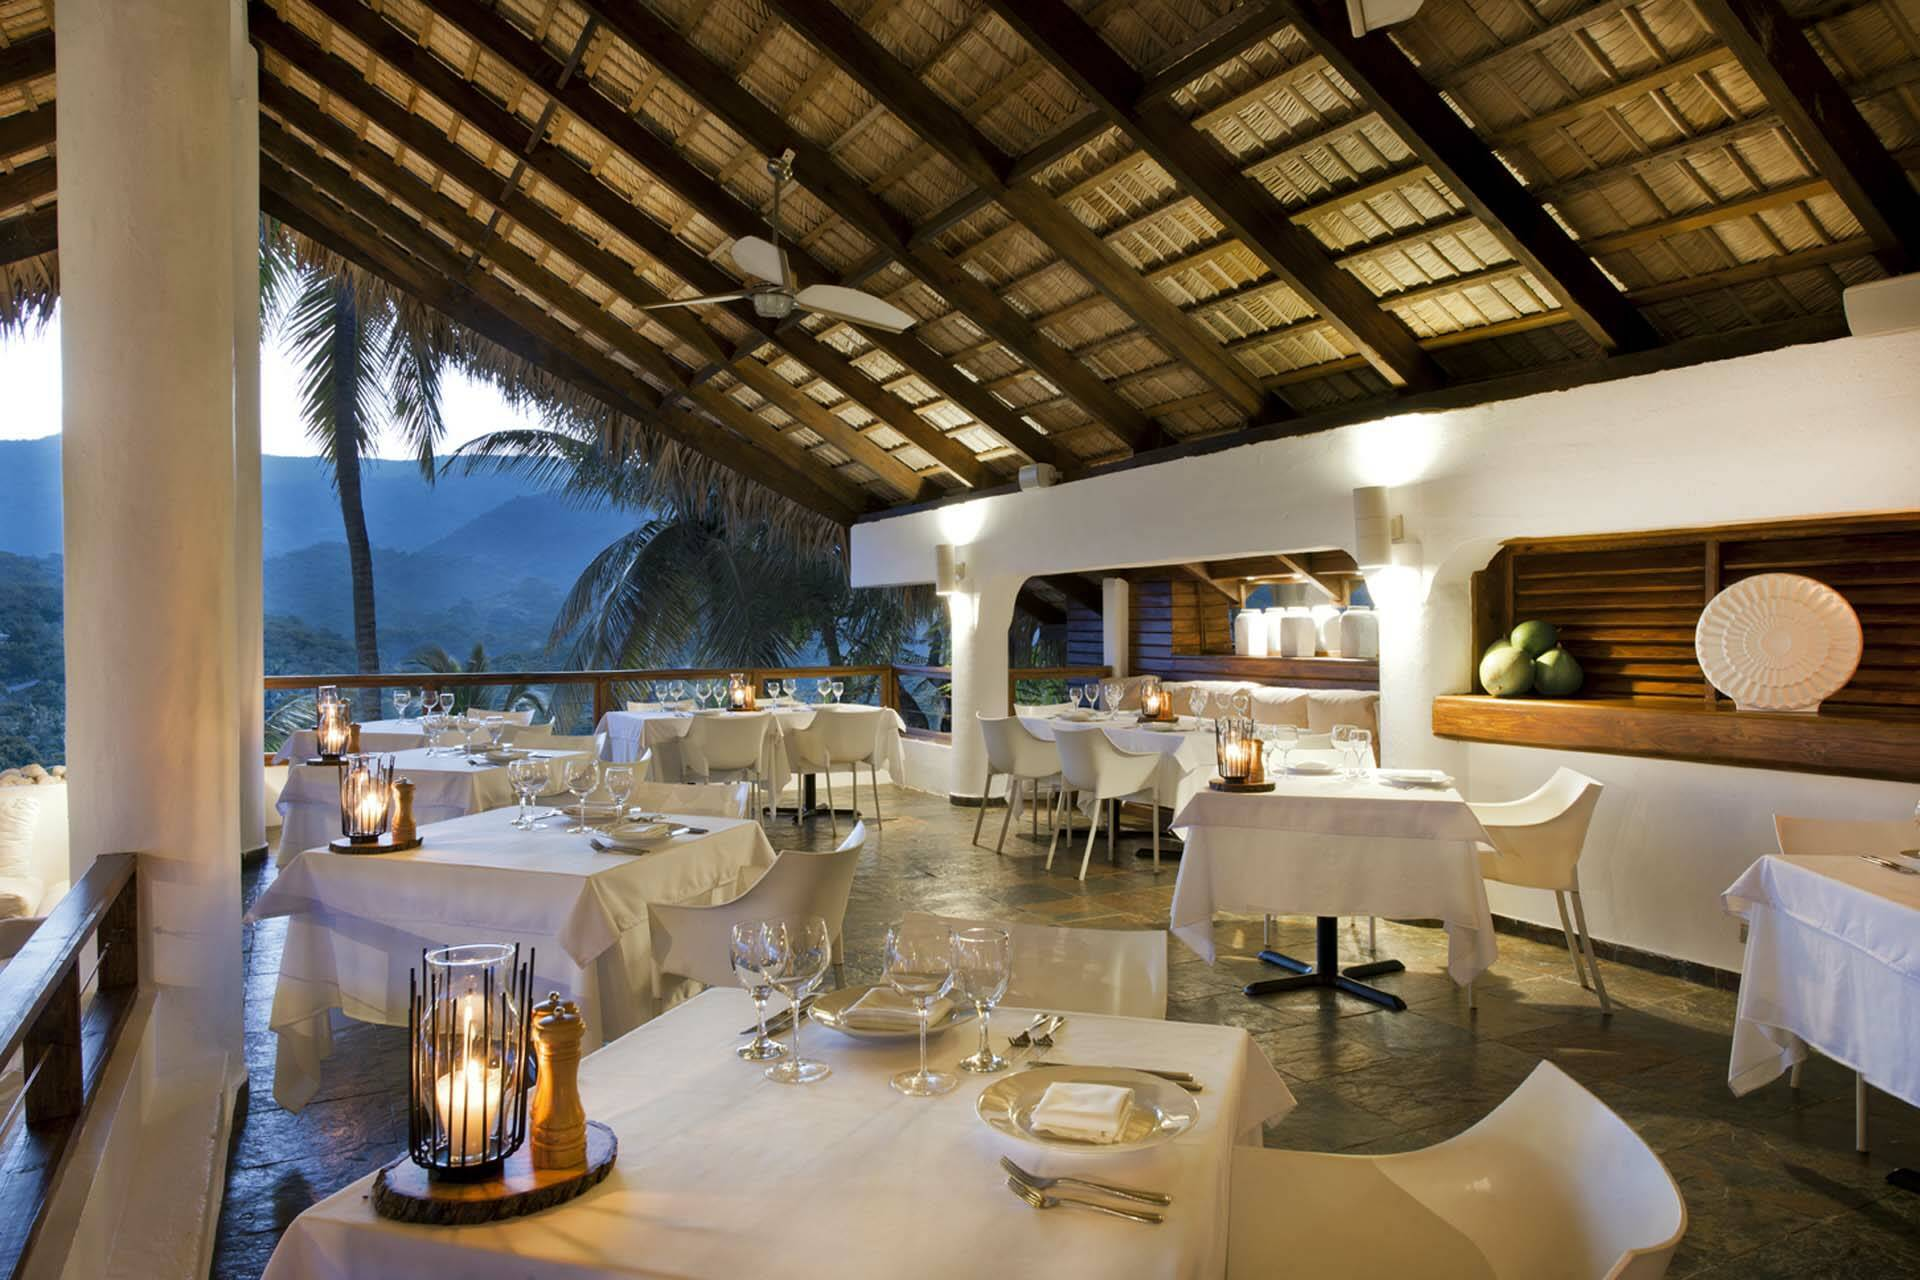 Casa Bonita Tropical Lodge Republique Dominicaine Restaurant